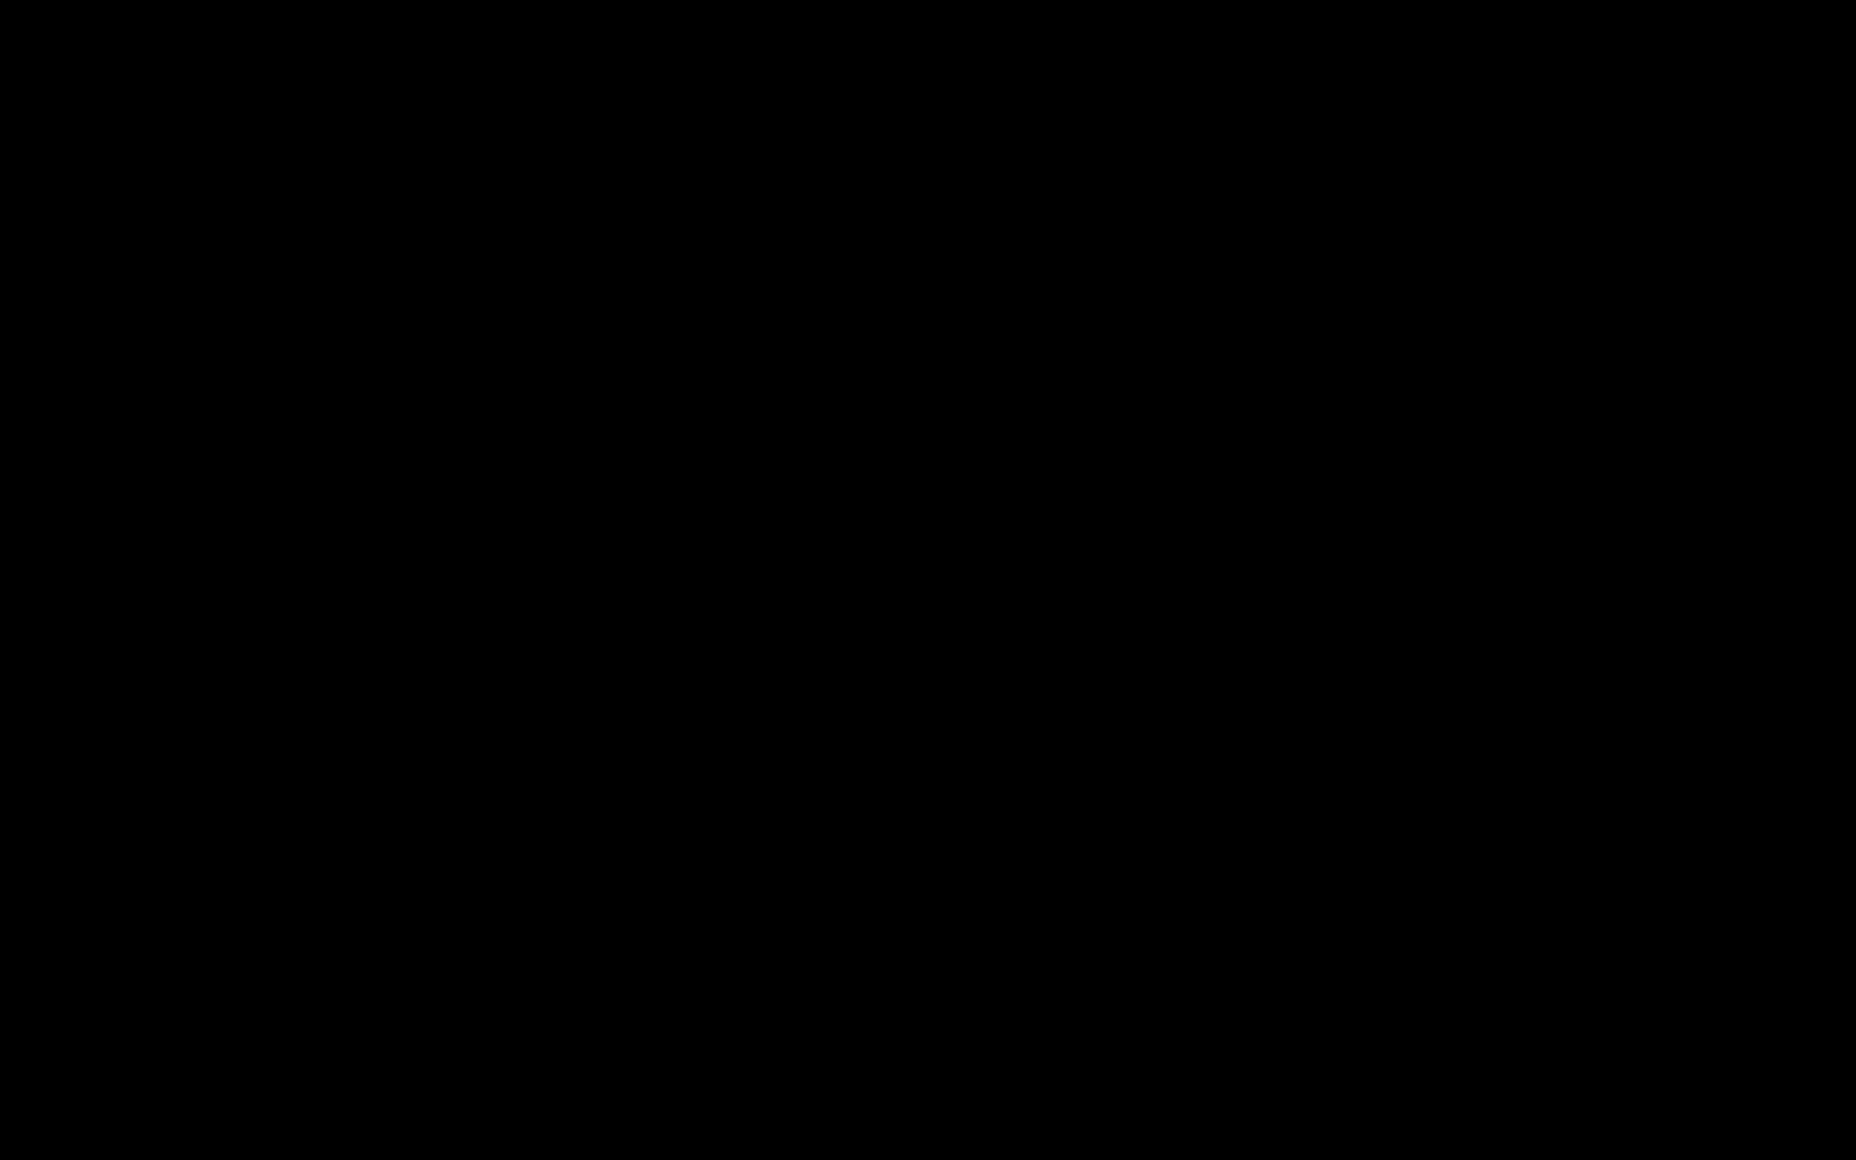 GBR 12935 dihydrochloride